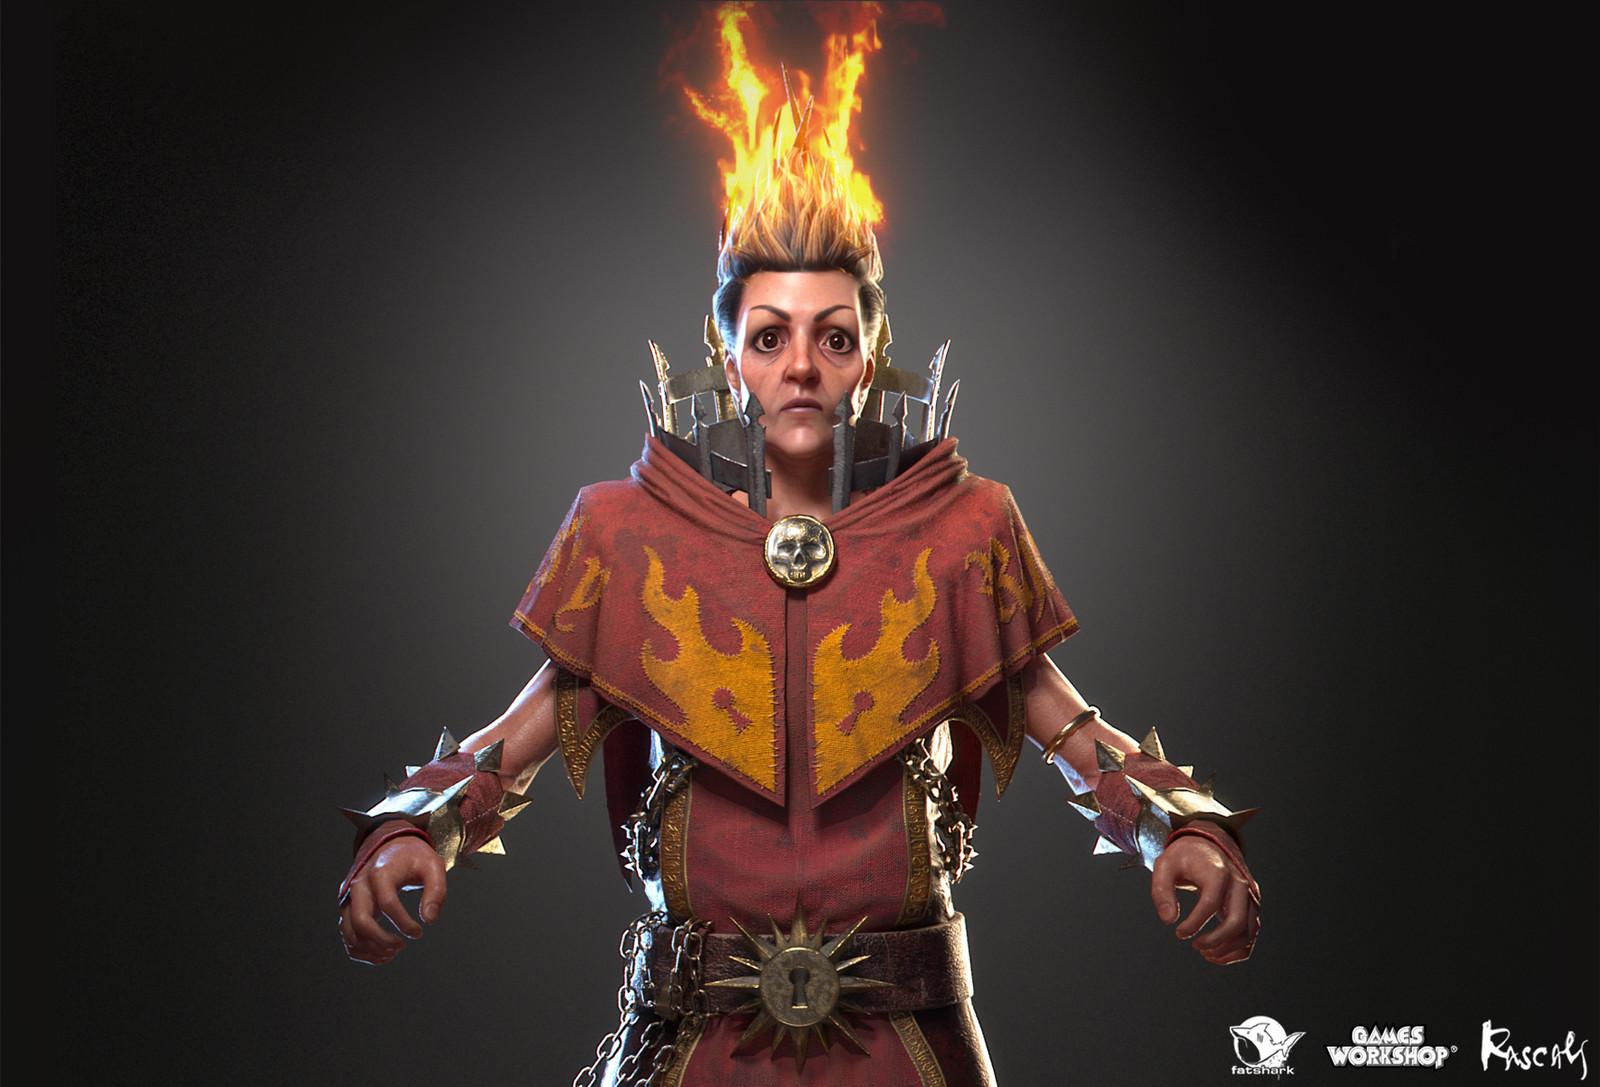 Sienna Fuegonasus: Battle Wizard is one of the playable hero variants Rascals made for Warhammer: Vermintide II, Fatshark's award-winning co-op meelee action published by Games Workshop.